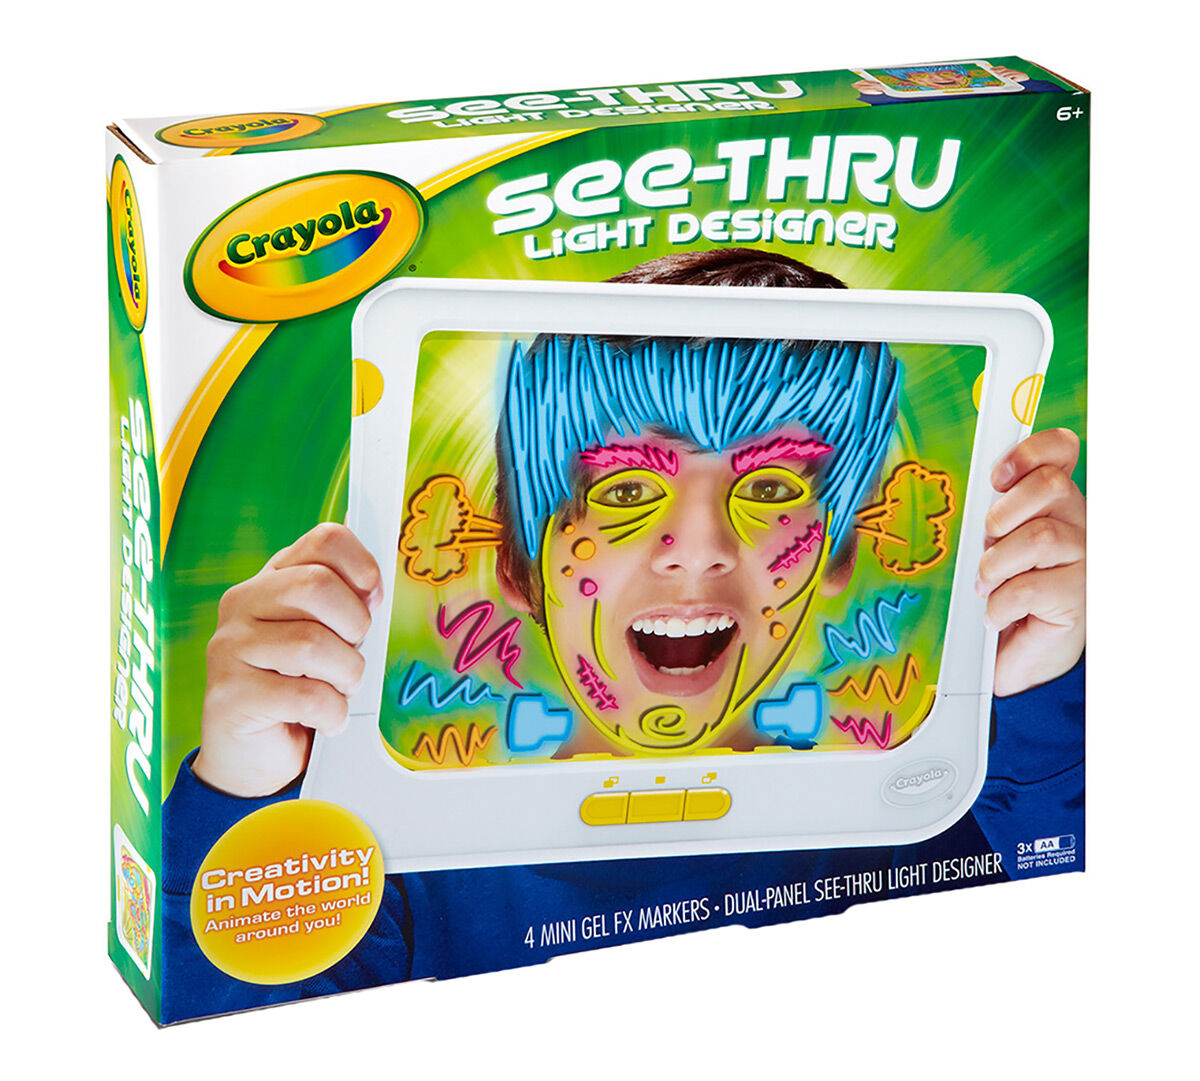 Crayola See Thru Light Designer Crayola